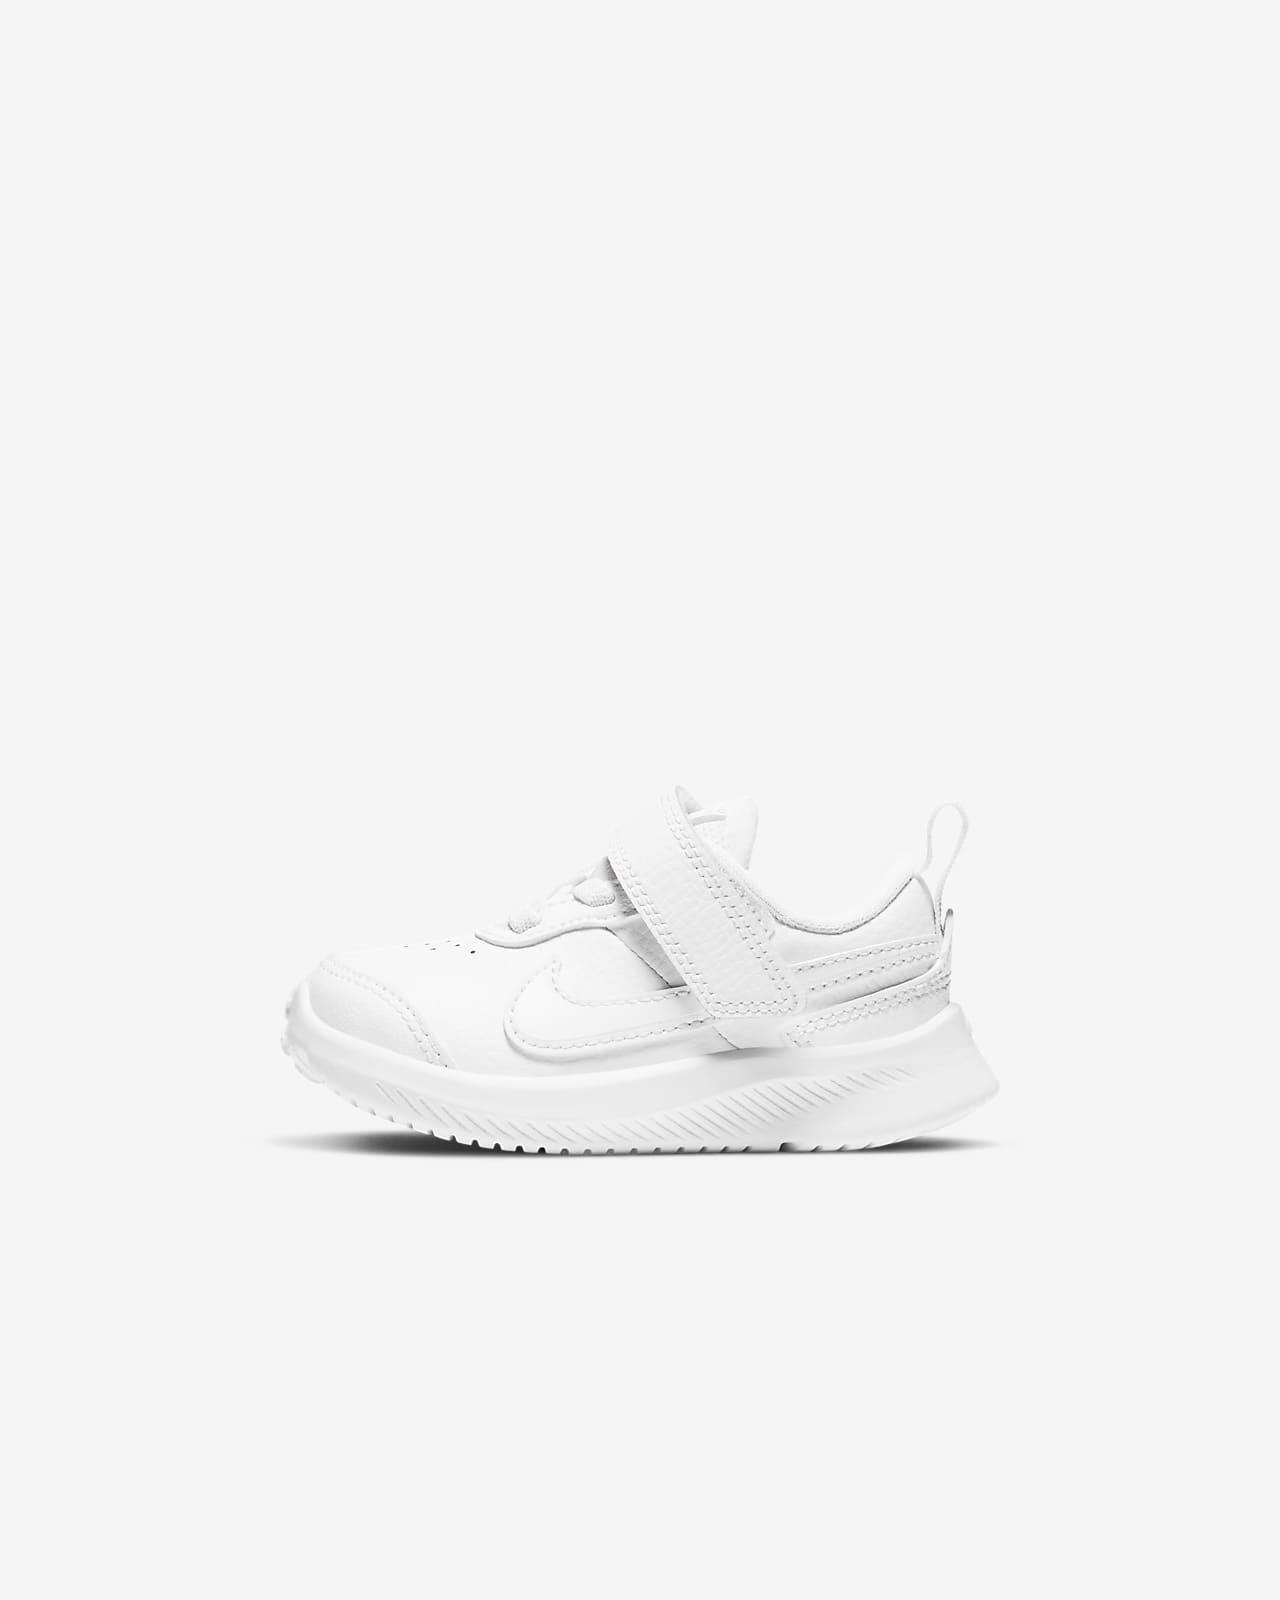 Nike Varsity Leather 嬰幼兒鞋款